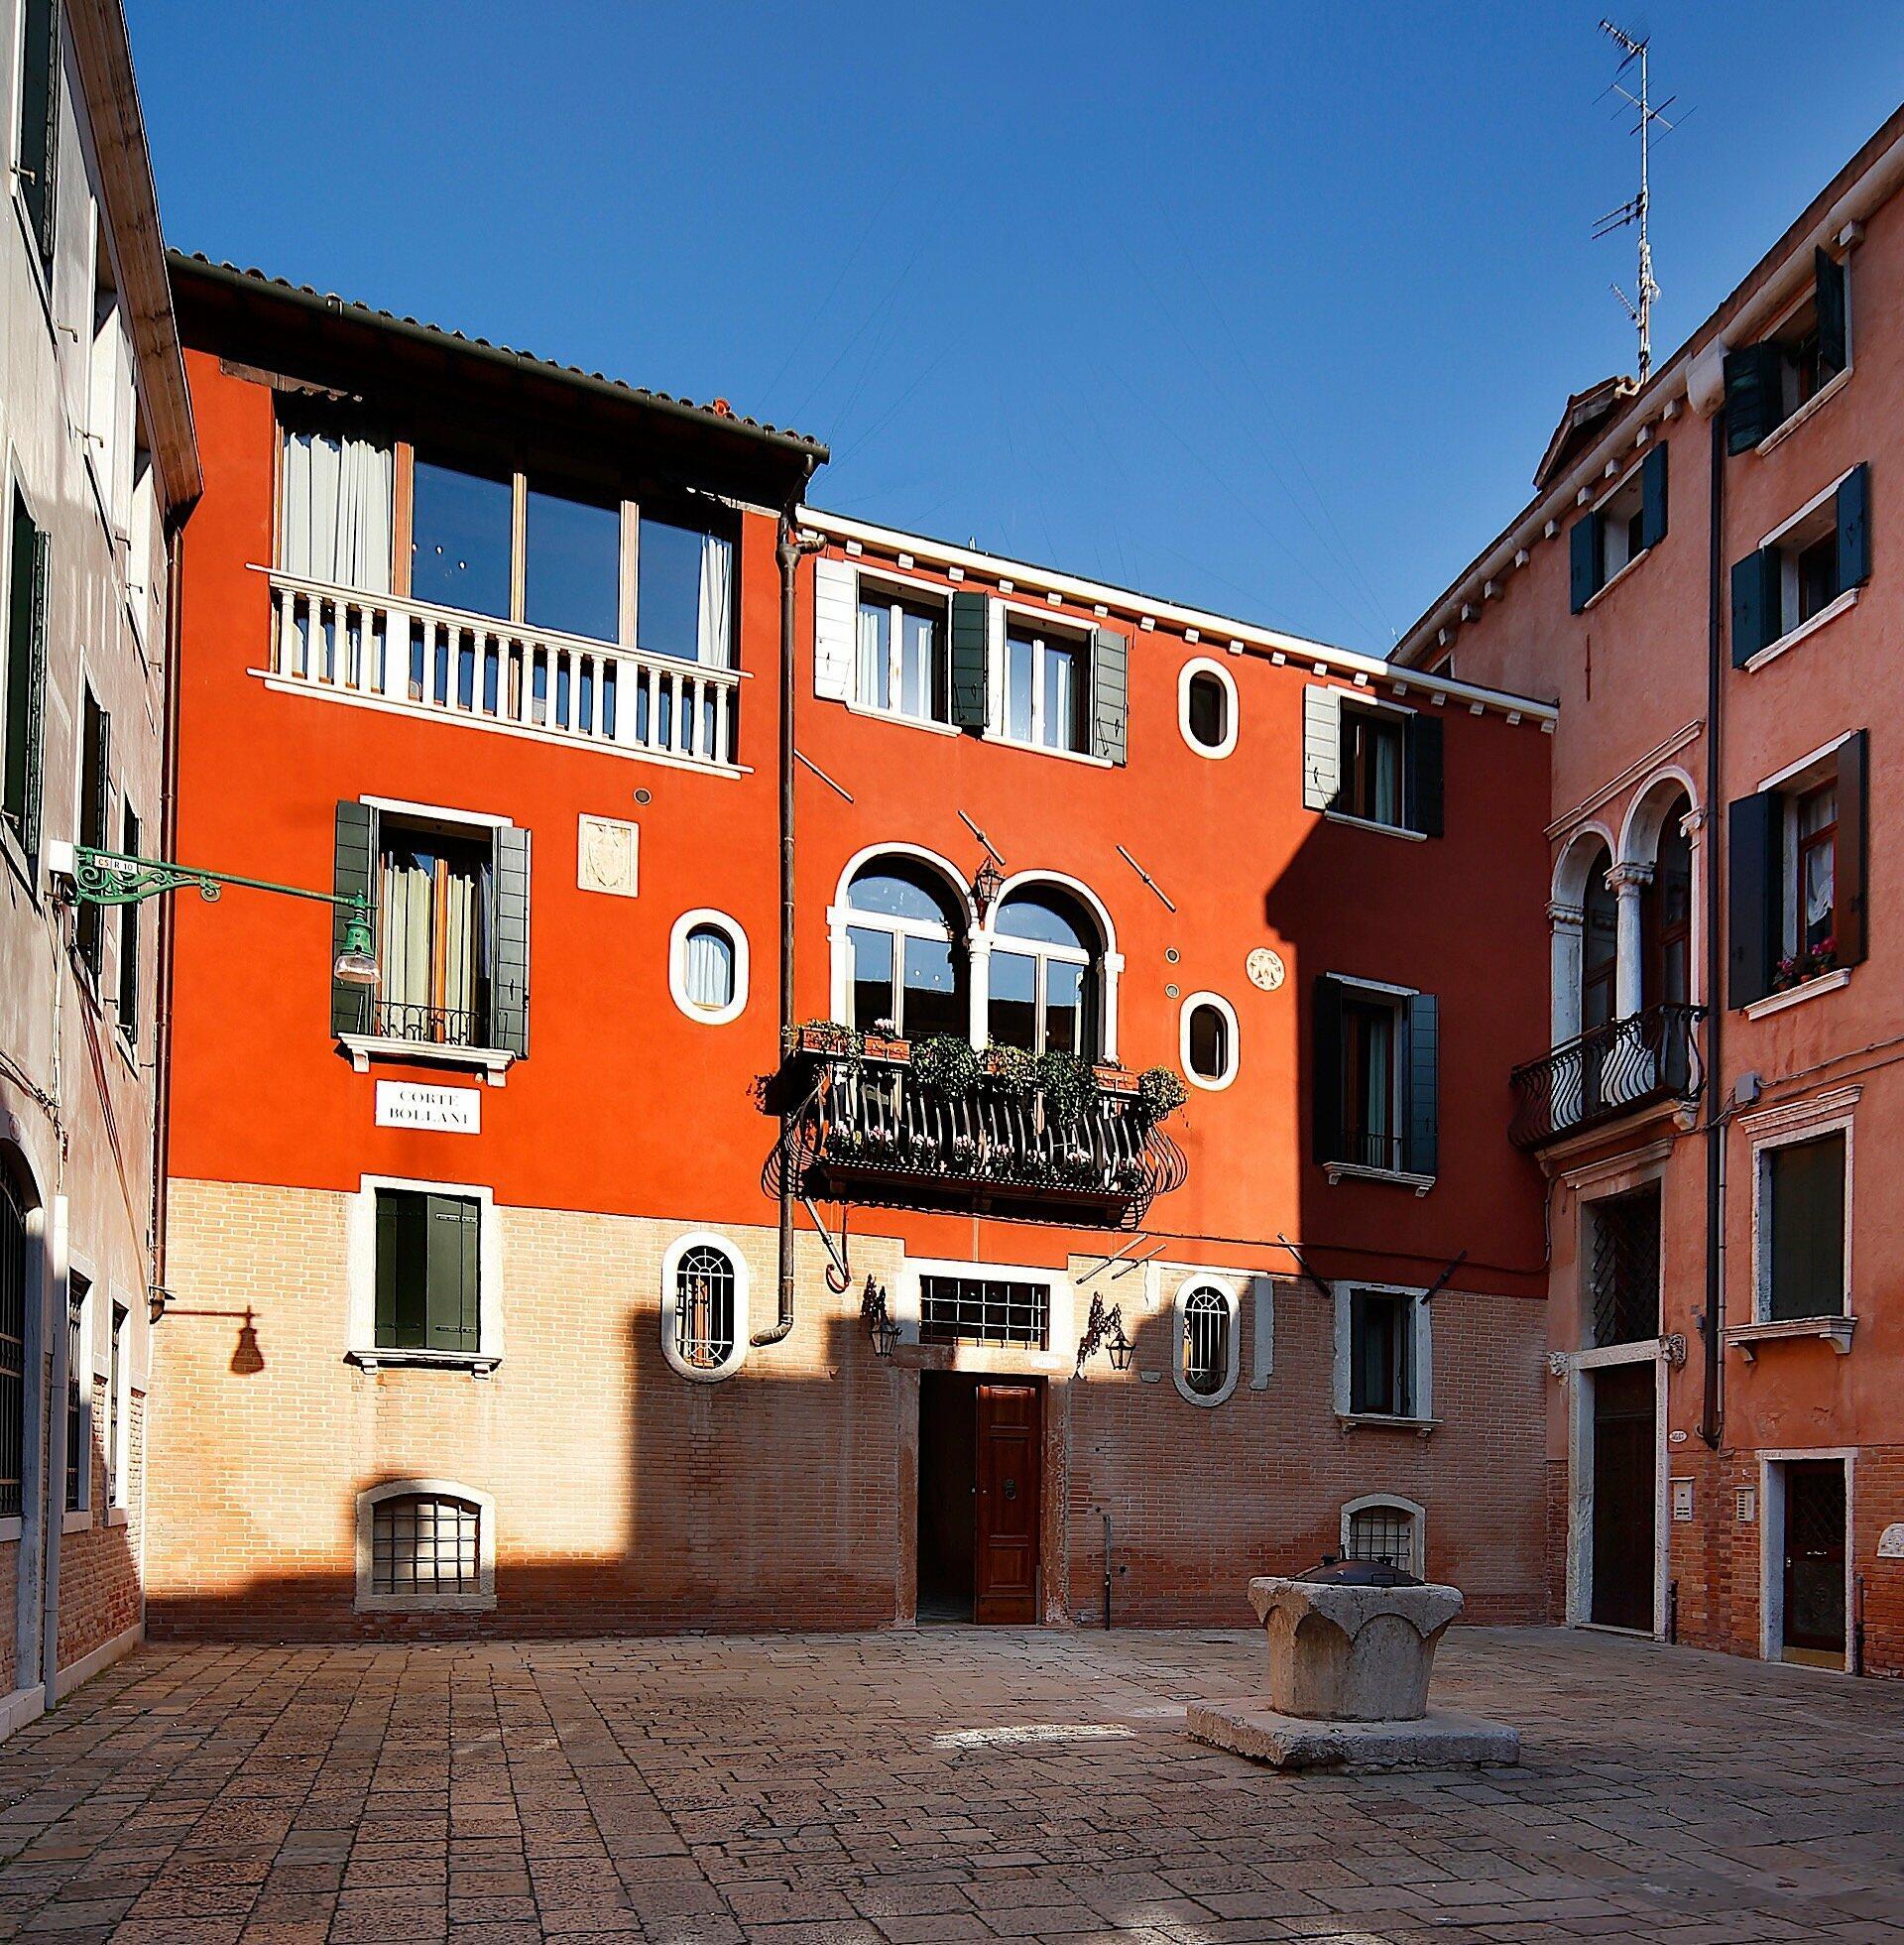 Hotel Bisanzio in Venice, Italy